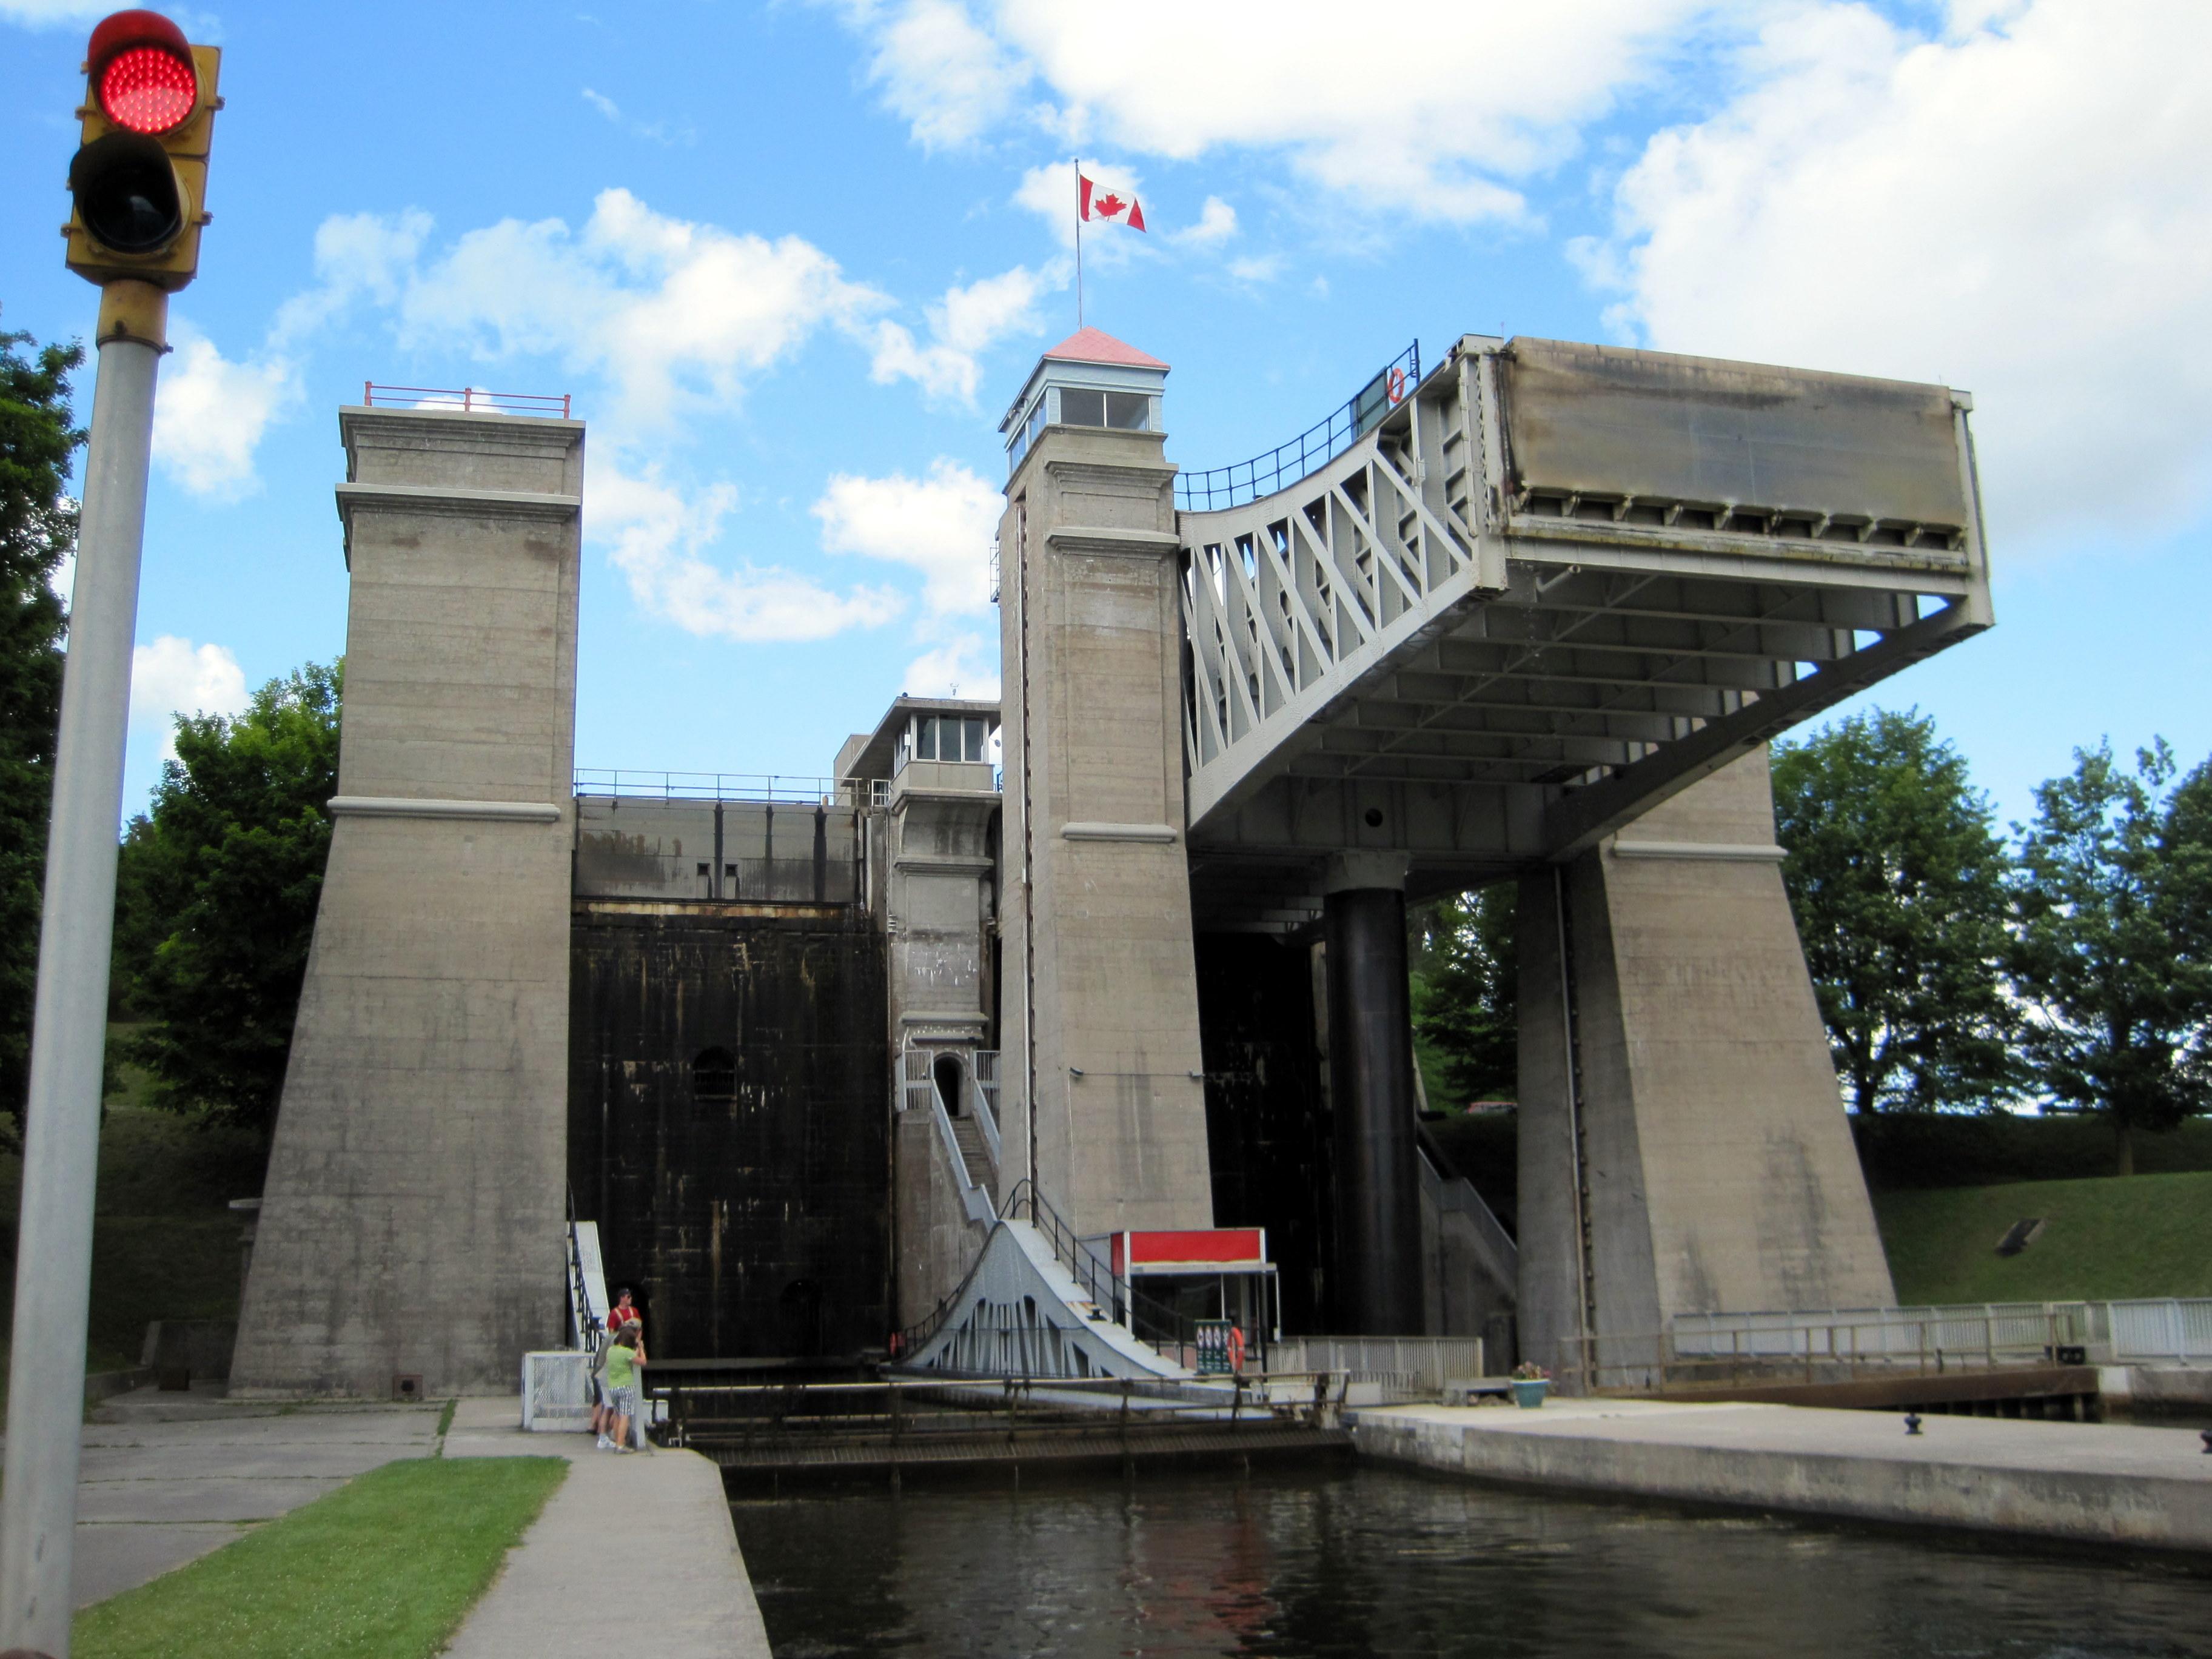 FilePeterborough Ontario  LiftLocks bjpg  Wikimedia